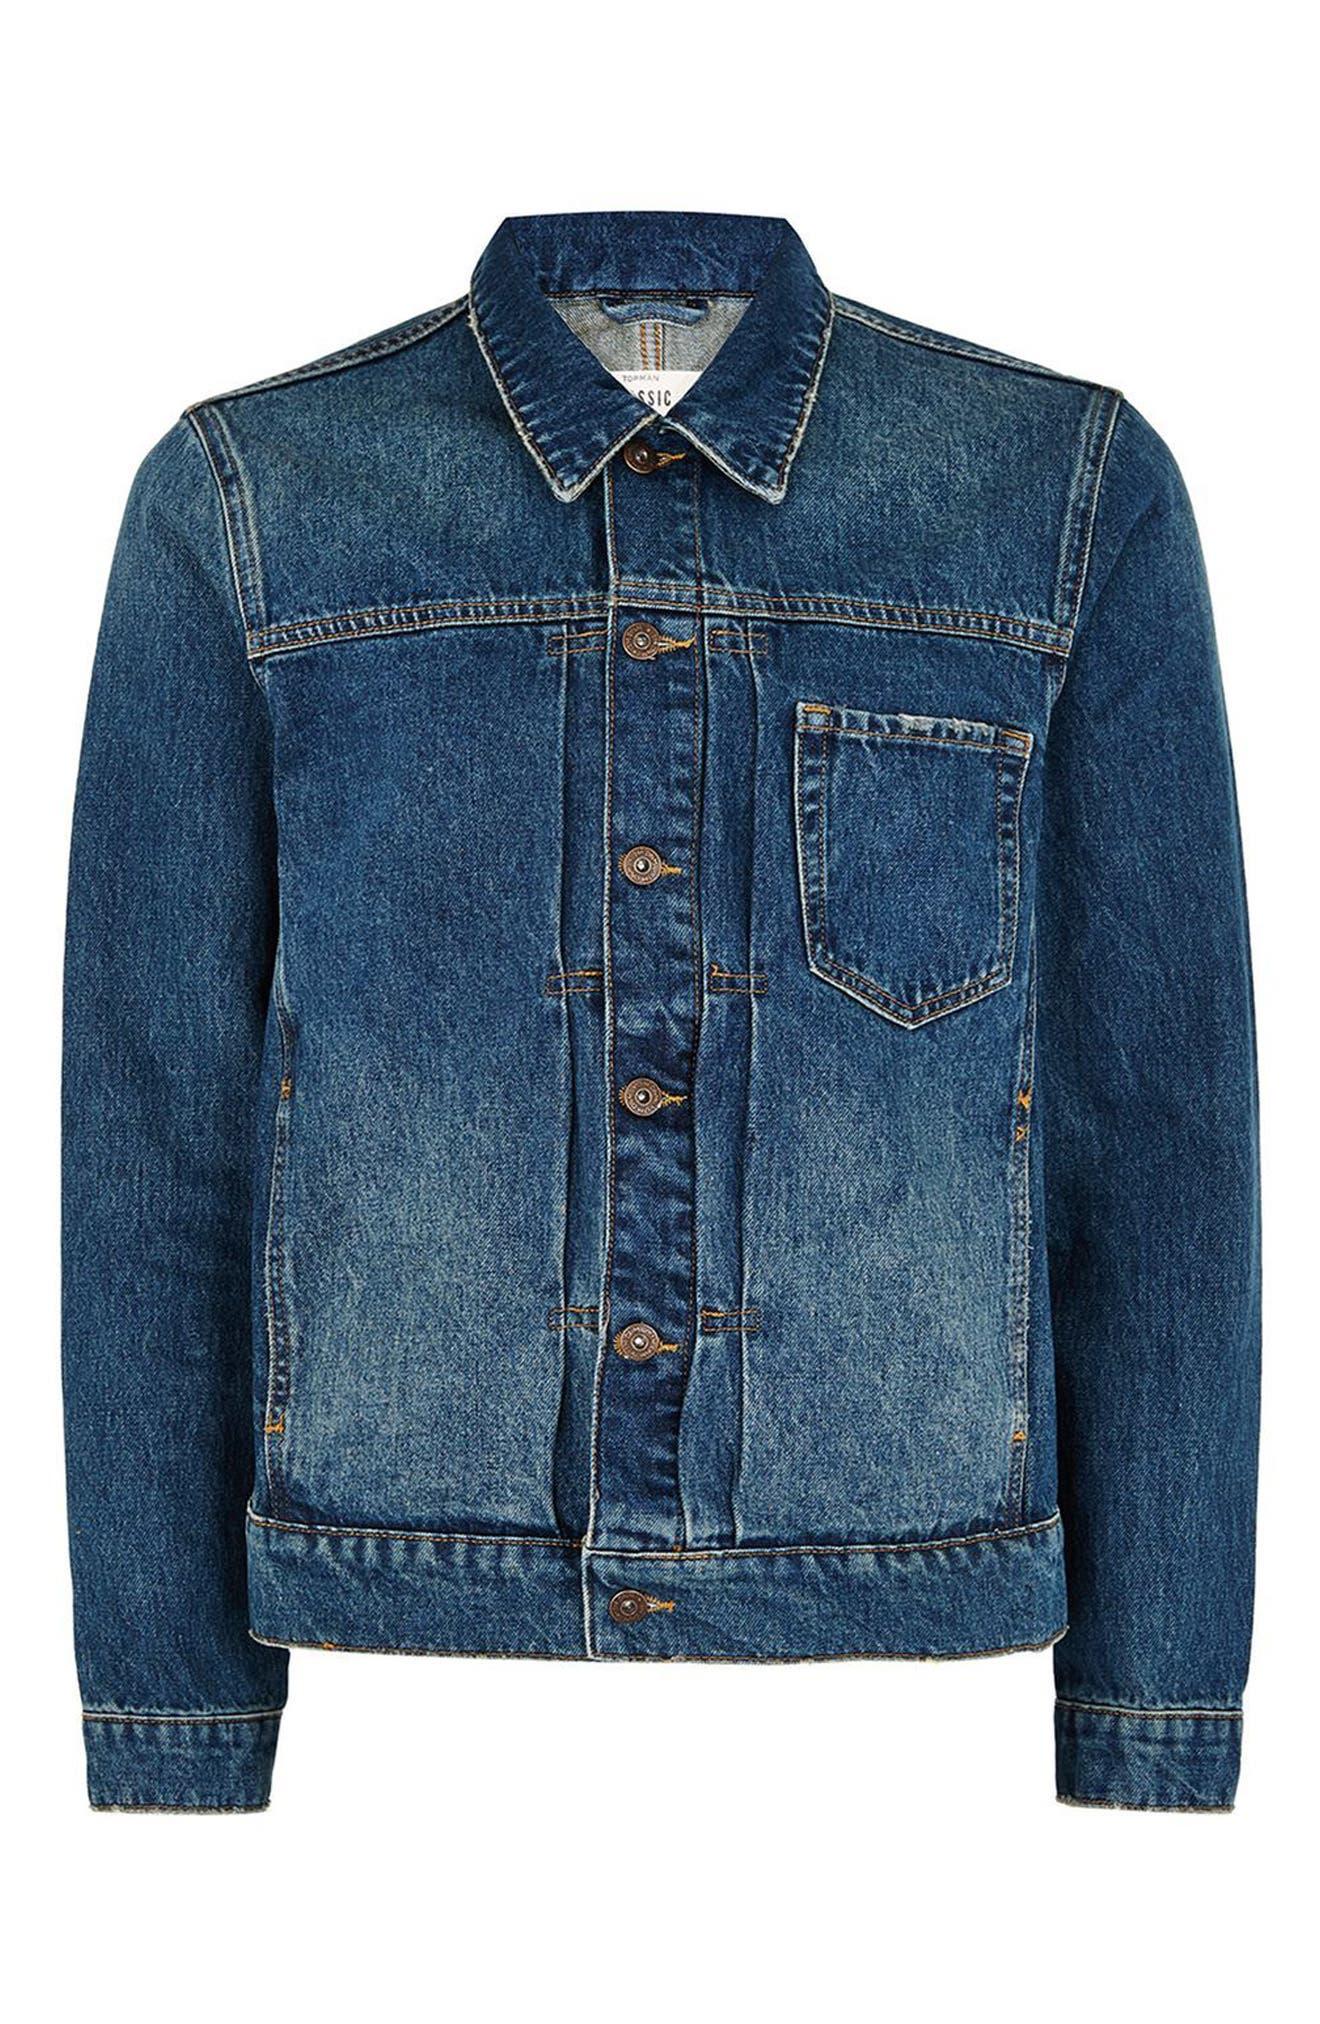 Cinch Back Denim Jacket,                             Alternate thumbnail 4, color,                             Mid Blue